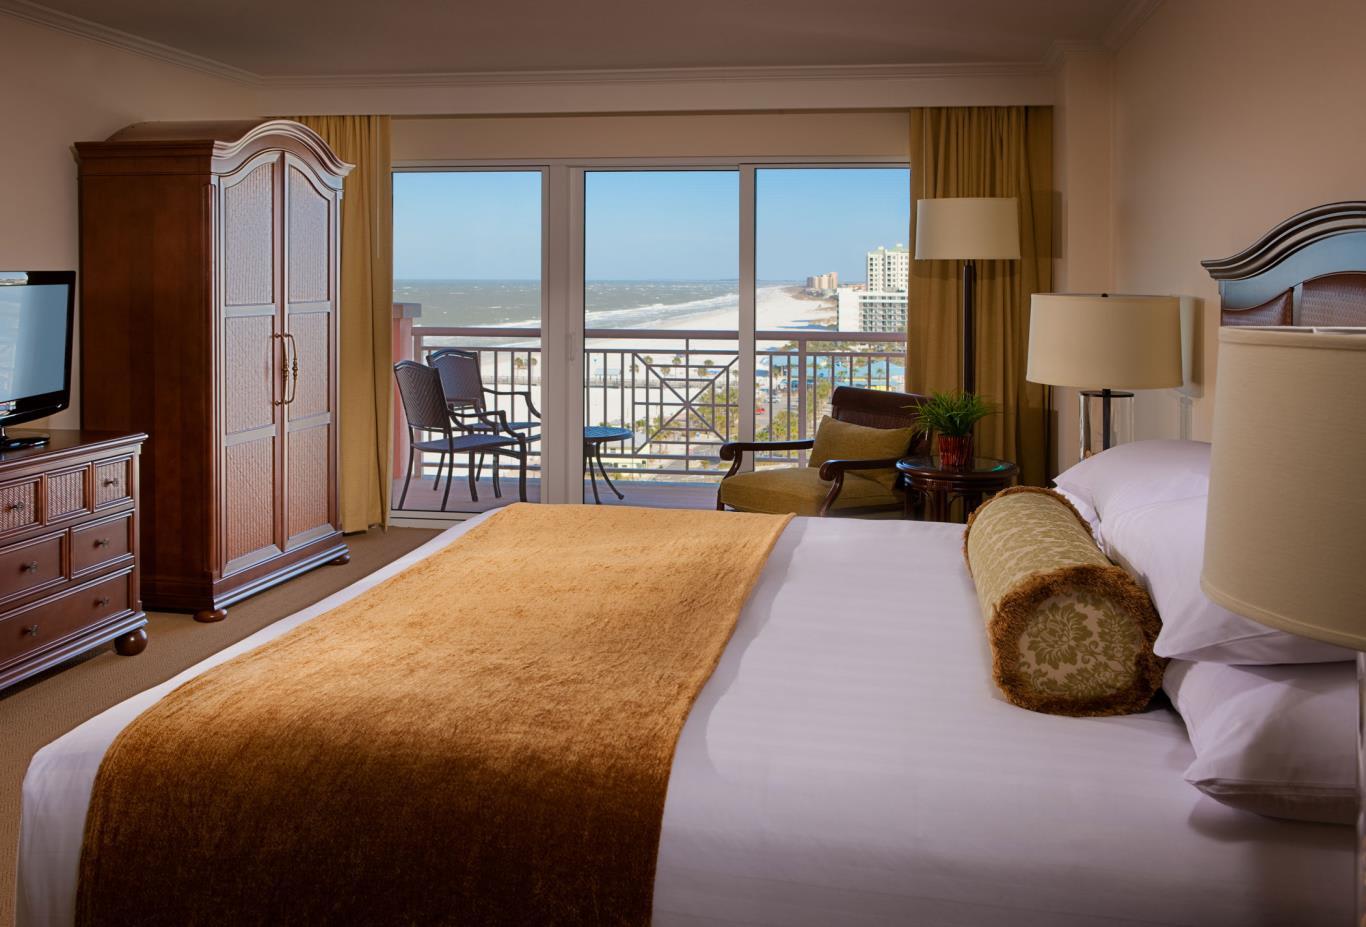 Premium/Gulf One Bedroom Suite